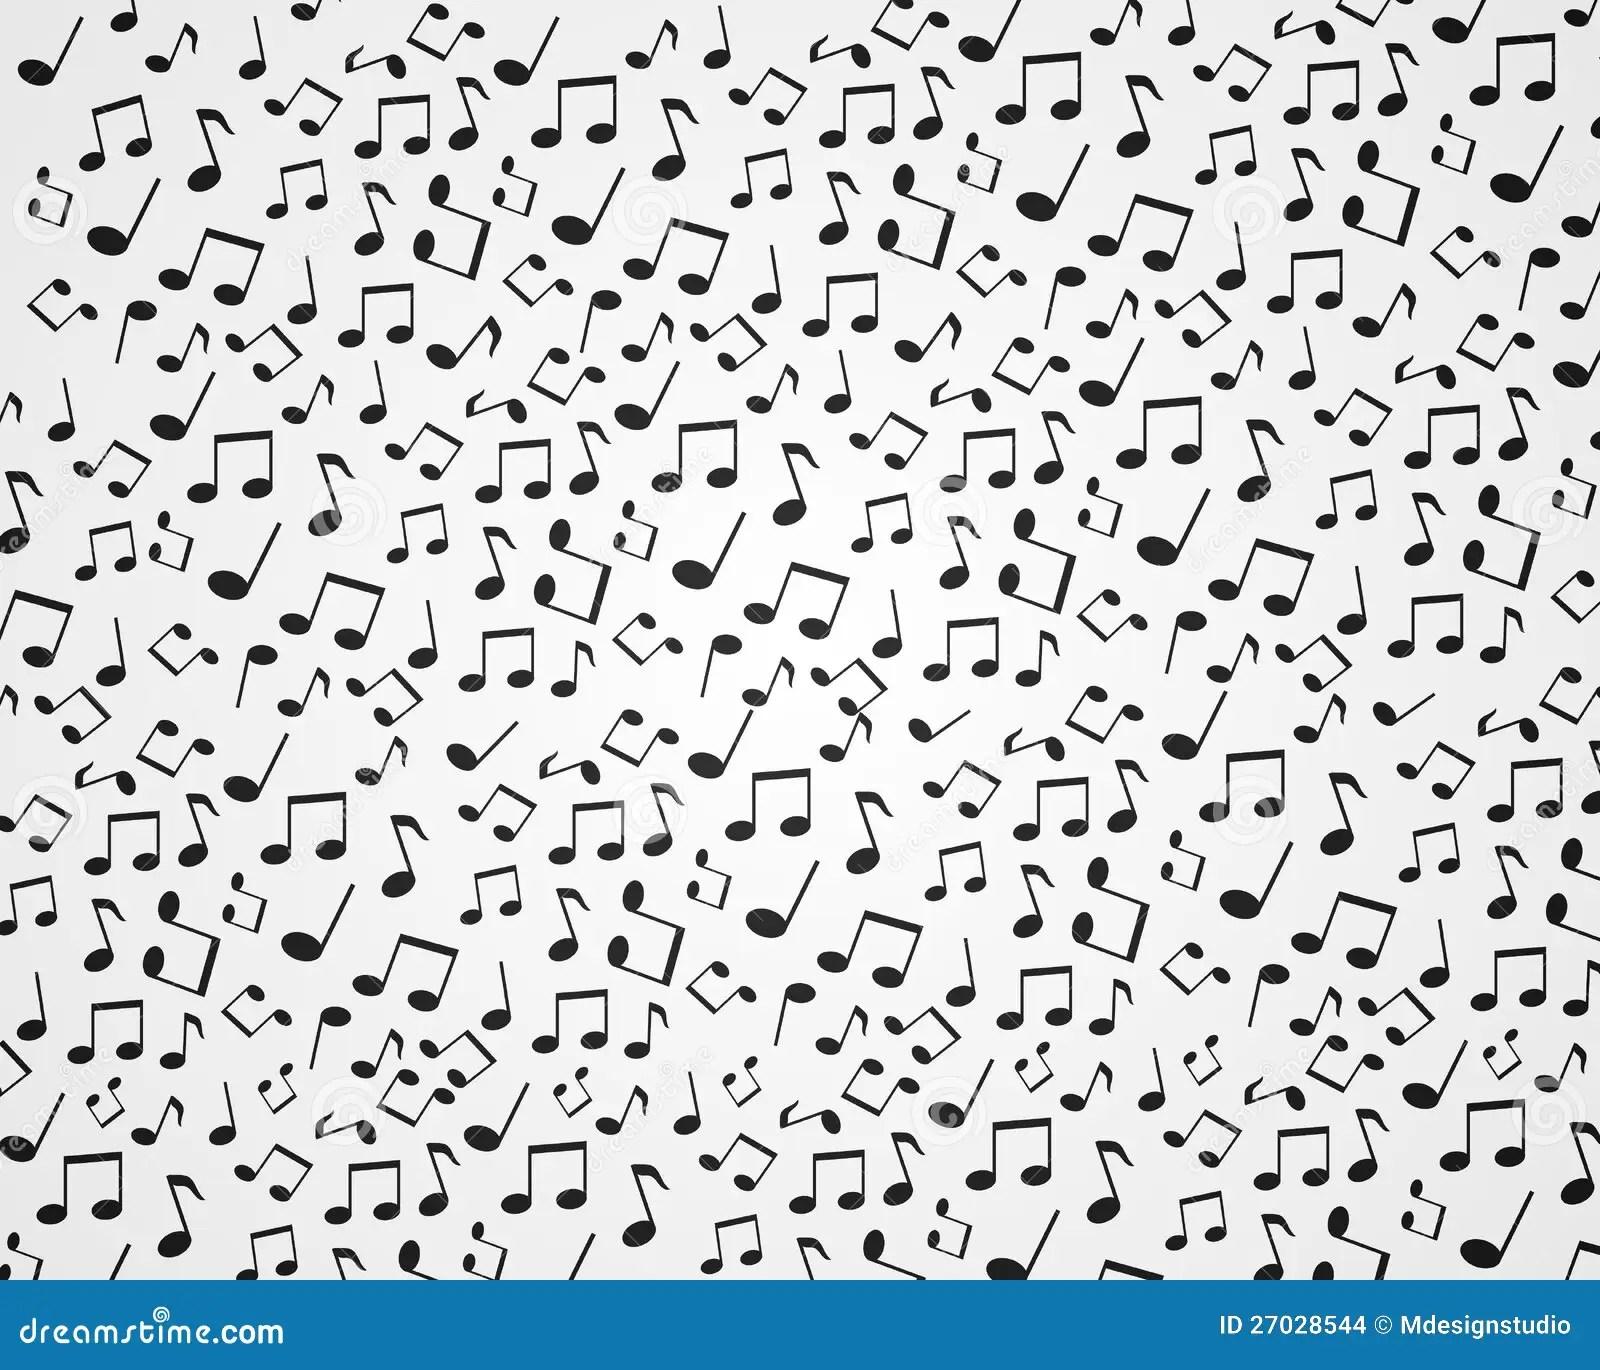 Wallpaper Hd Note L